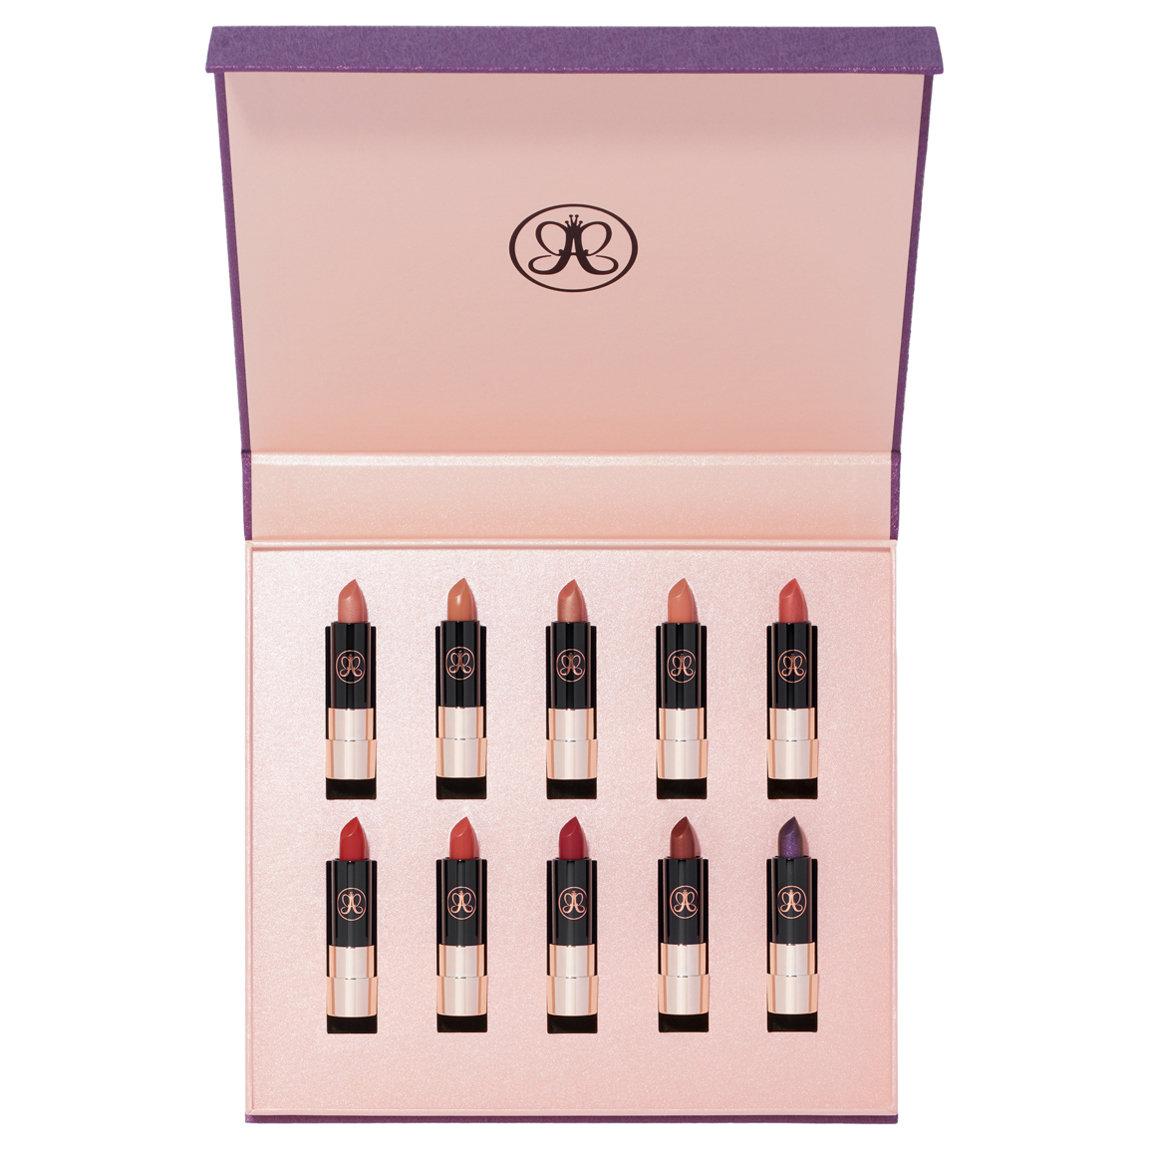 10 mini Anastasia Beverly Hills Matte Lipsticks in new shades (a $75 value)